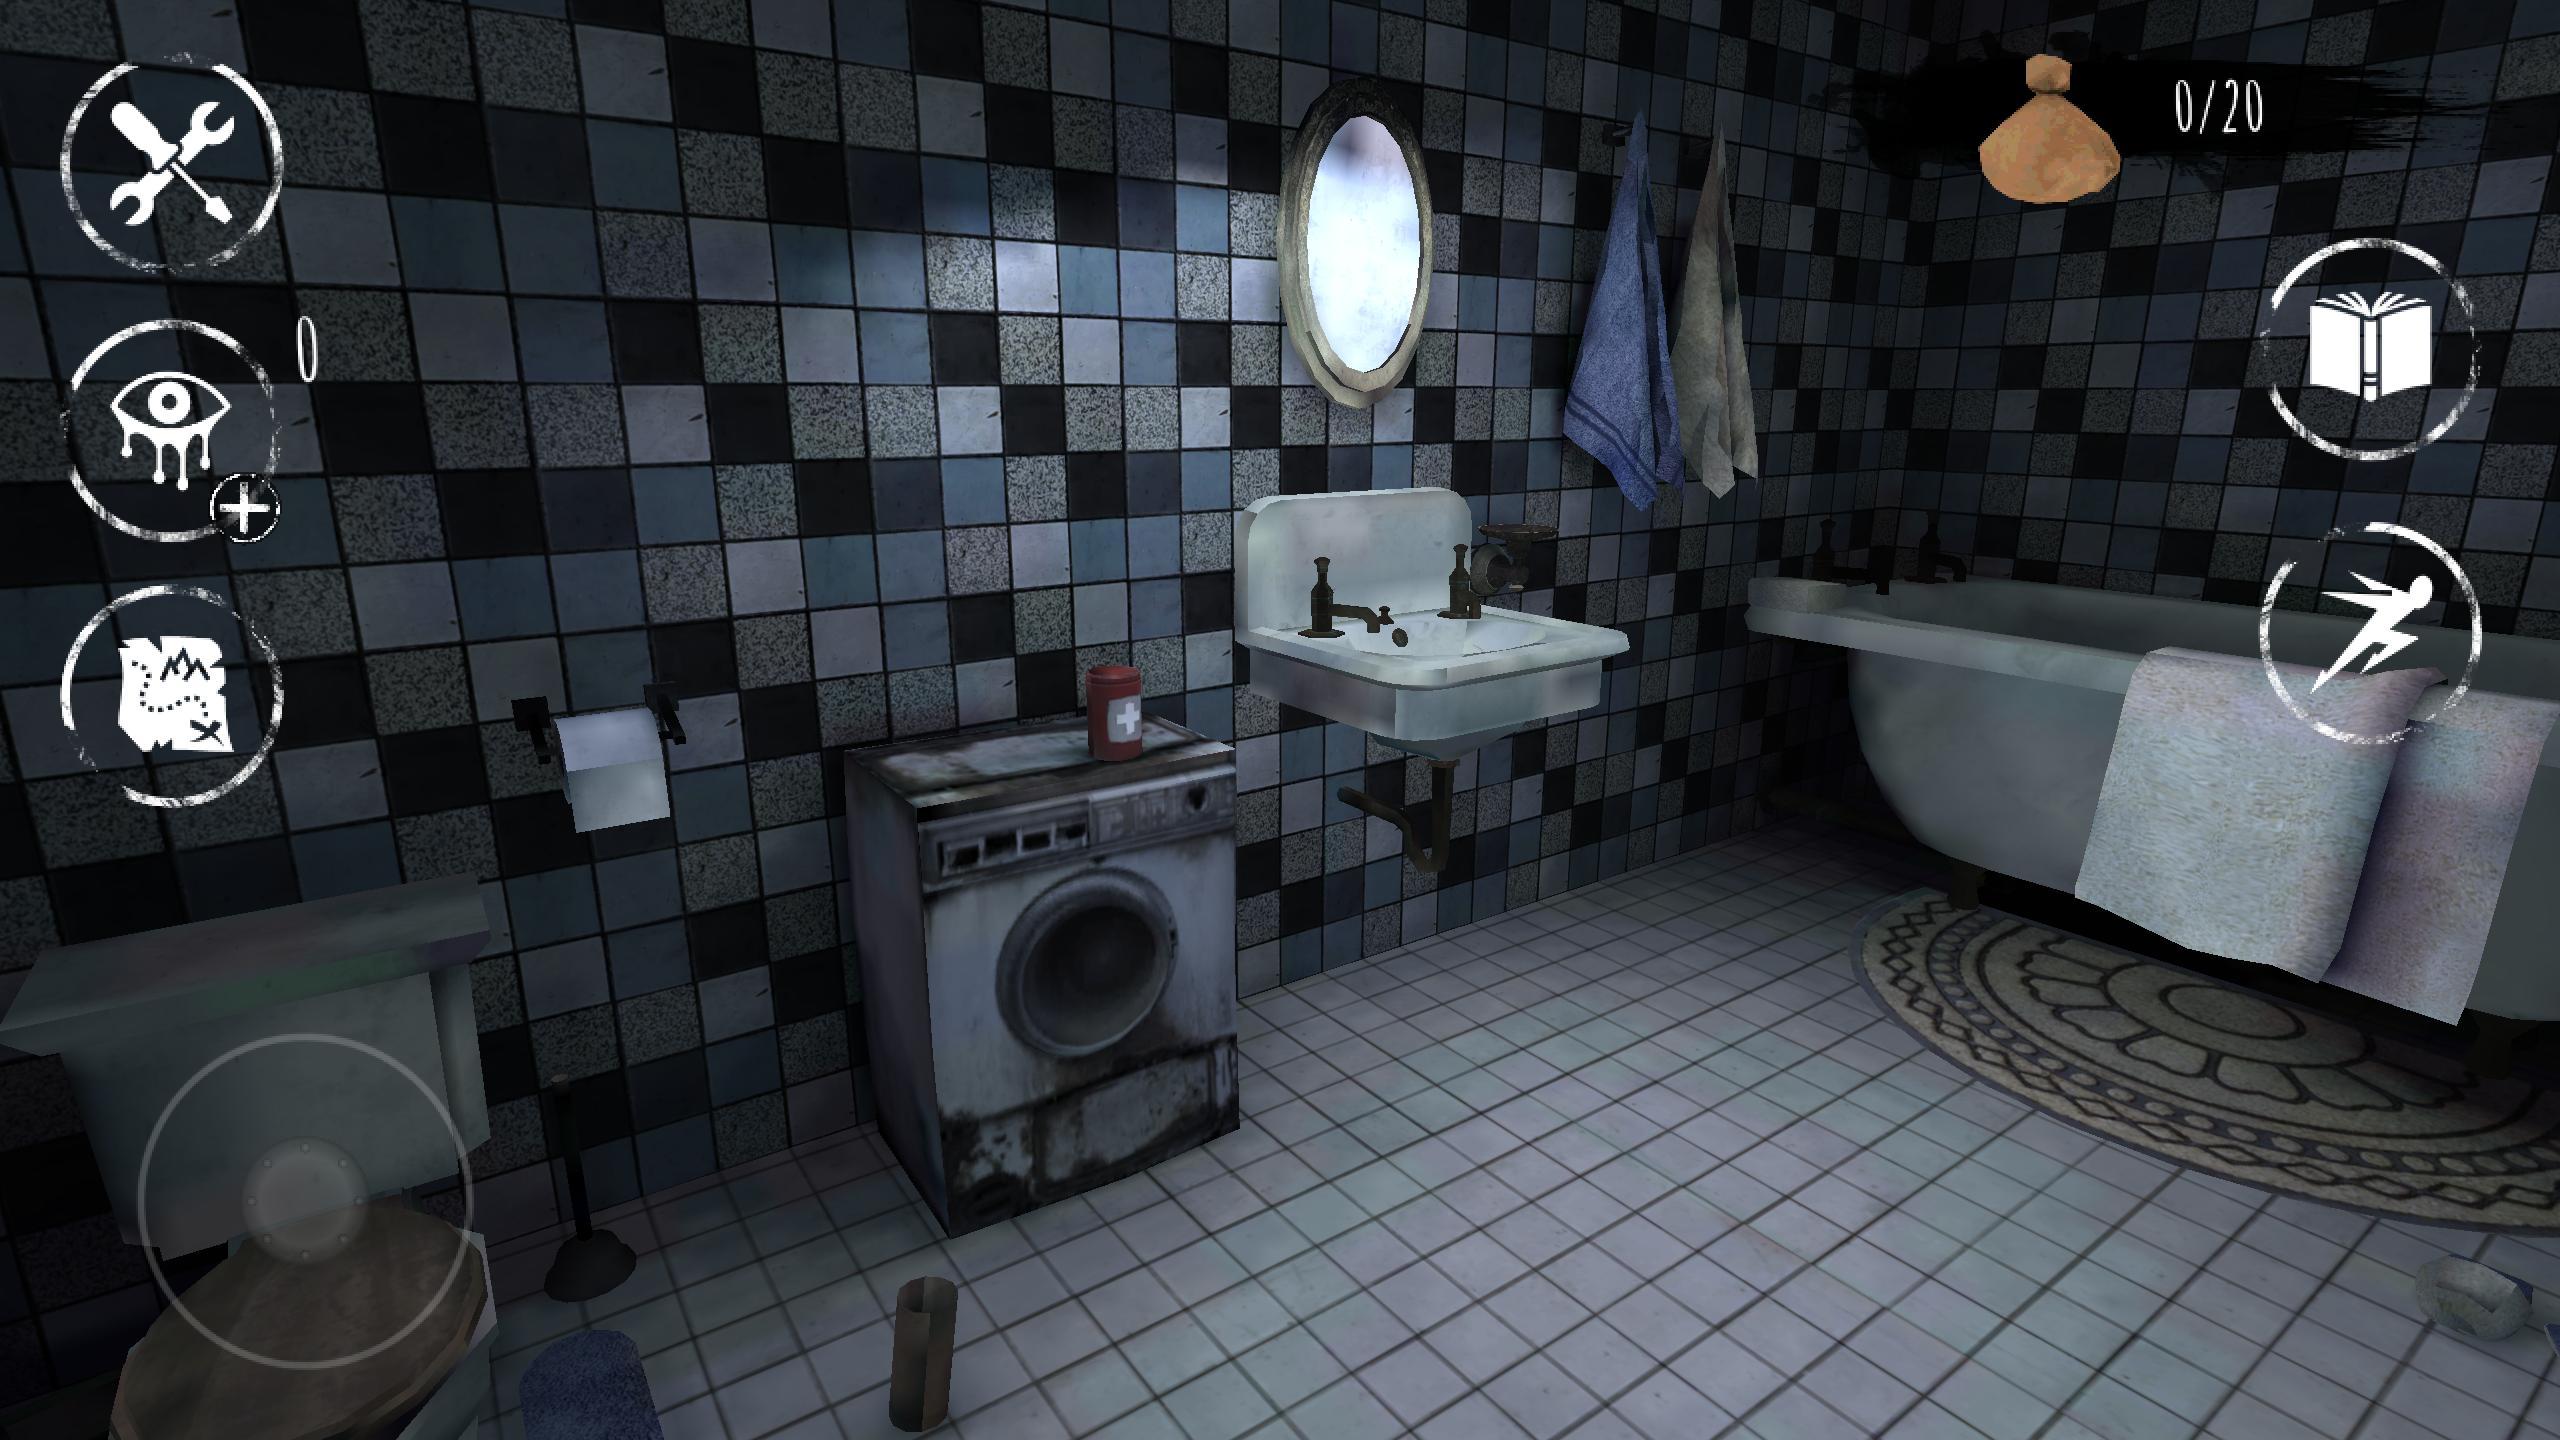 Eyes: Scary Thriller - Creepy Horror Game 6.1.1 Screenshot 7